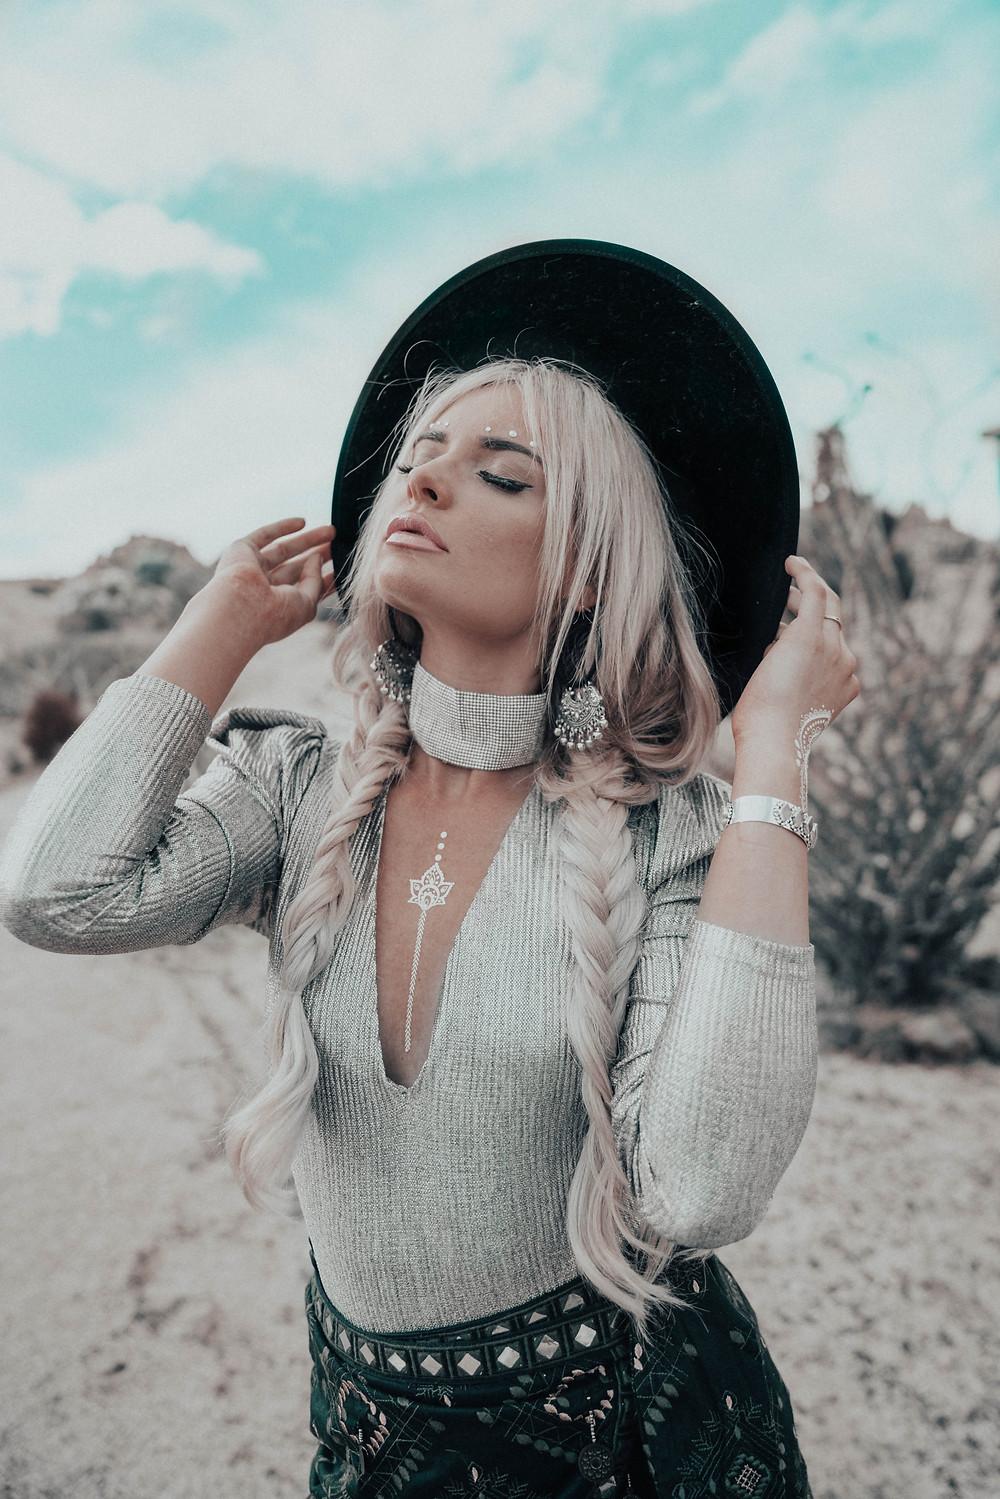 Bohemian outfit,What to wear to Coachella, Coachella blog fashion, coachella outfit, festival style, Coachella lineup, Coachella 2018, Coachella outfits